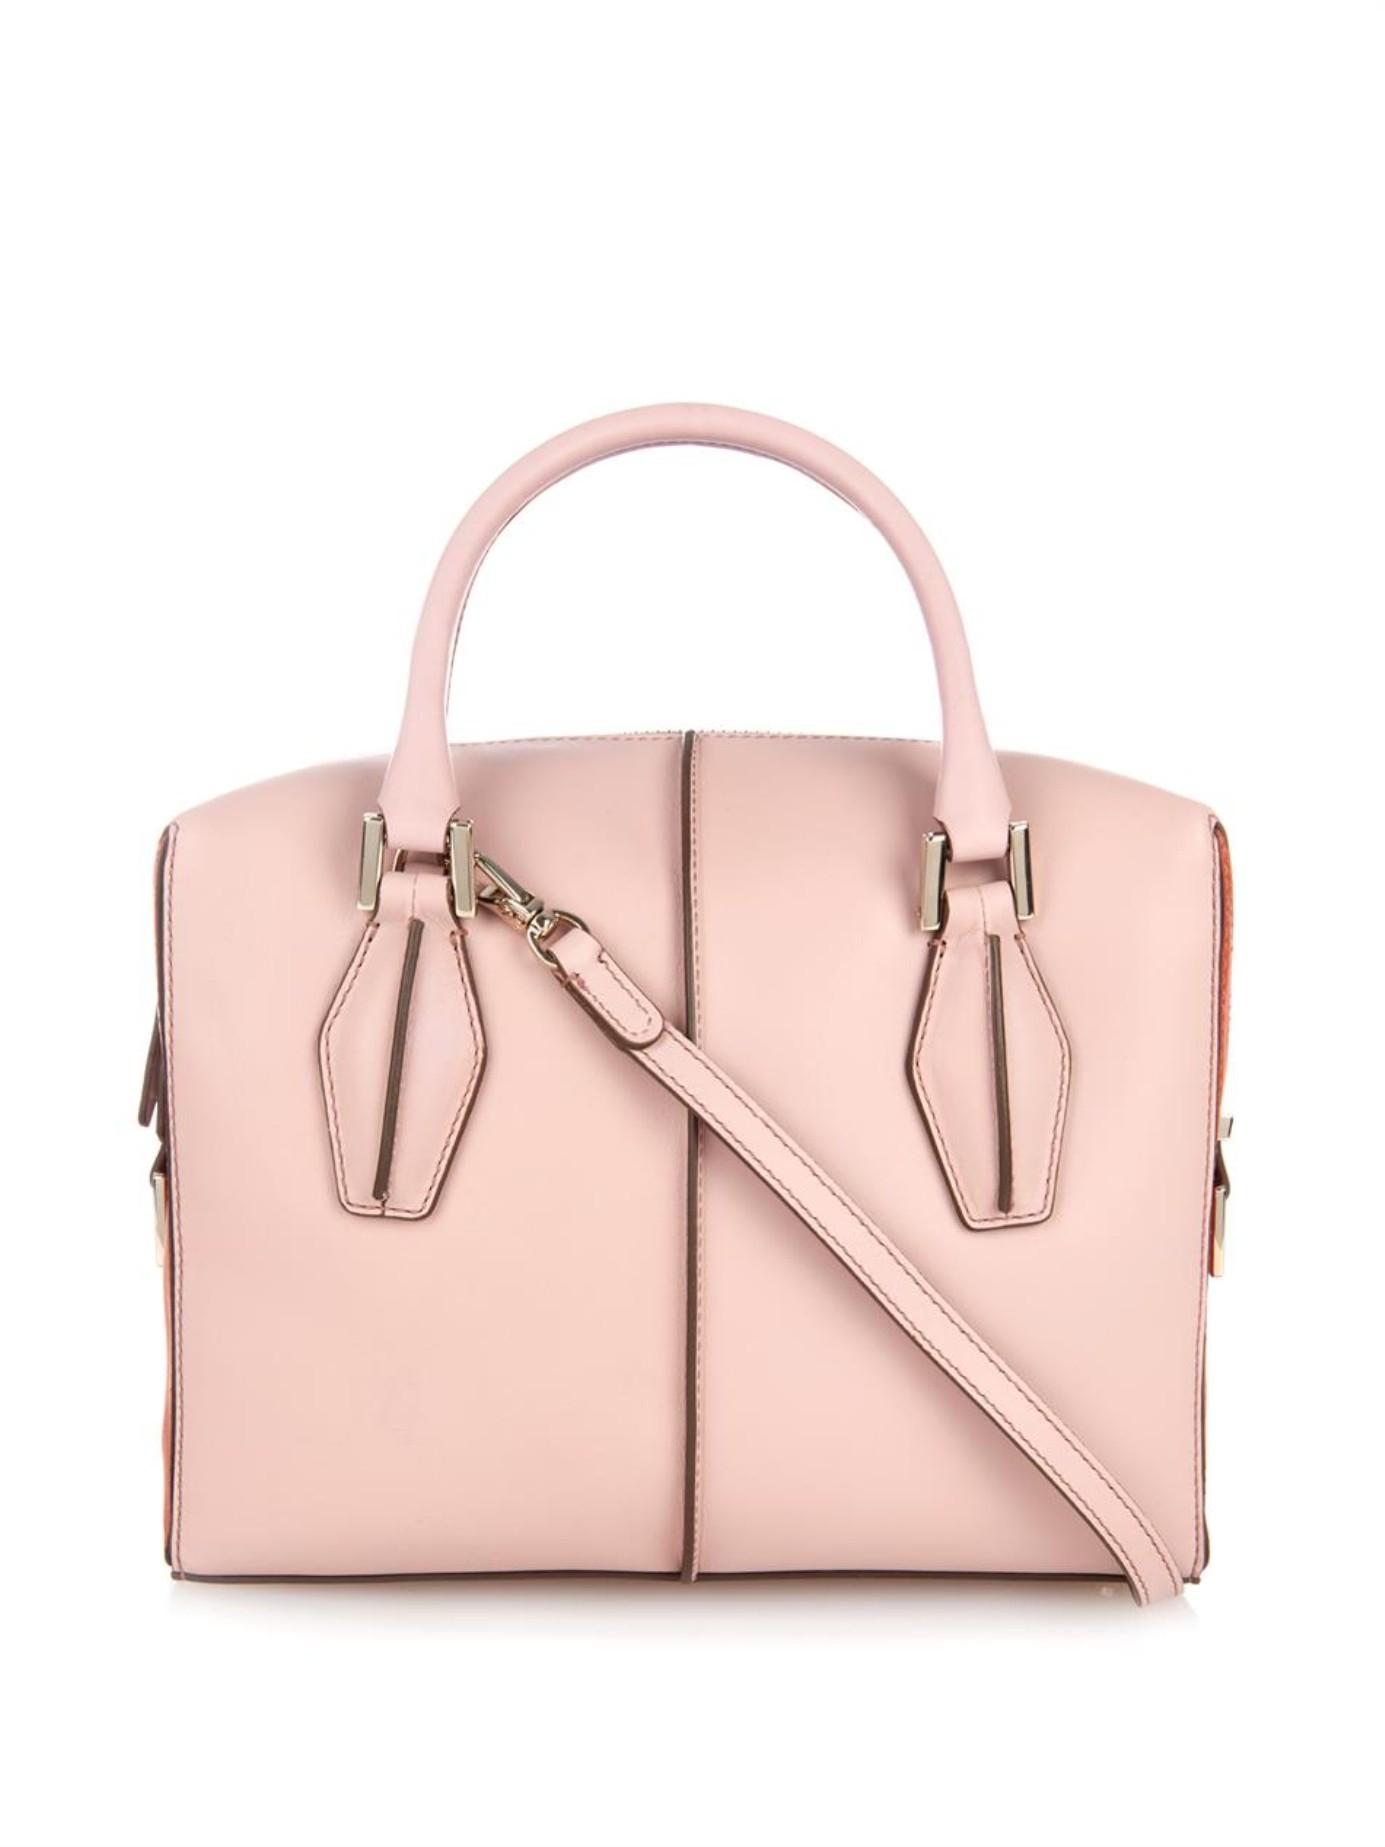 14e6af47f96 Tod's D-Cube Small Shoulder Bag in Pink - Lyst